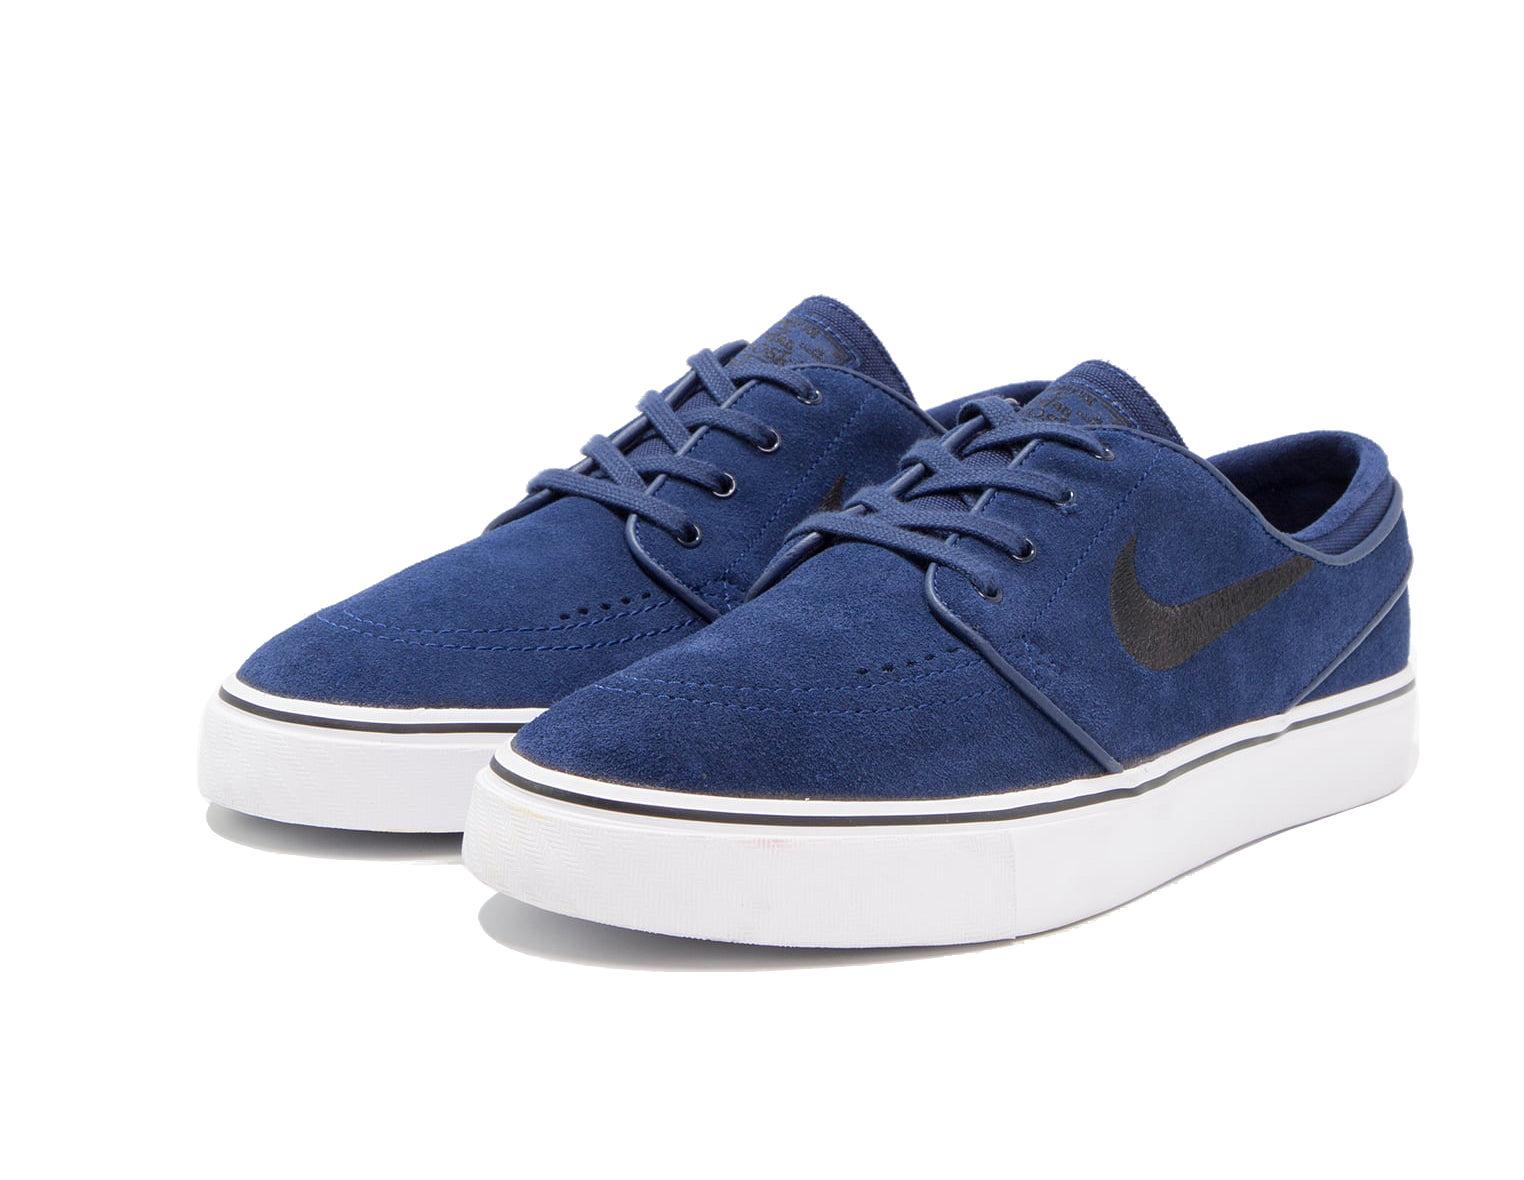 Buty Nike Sb Stefan Janoski (Binary Blue / Black)